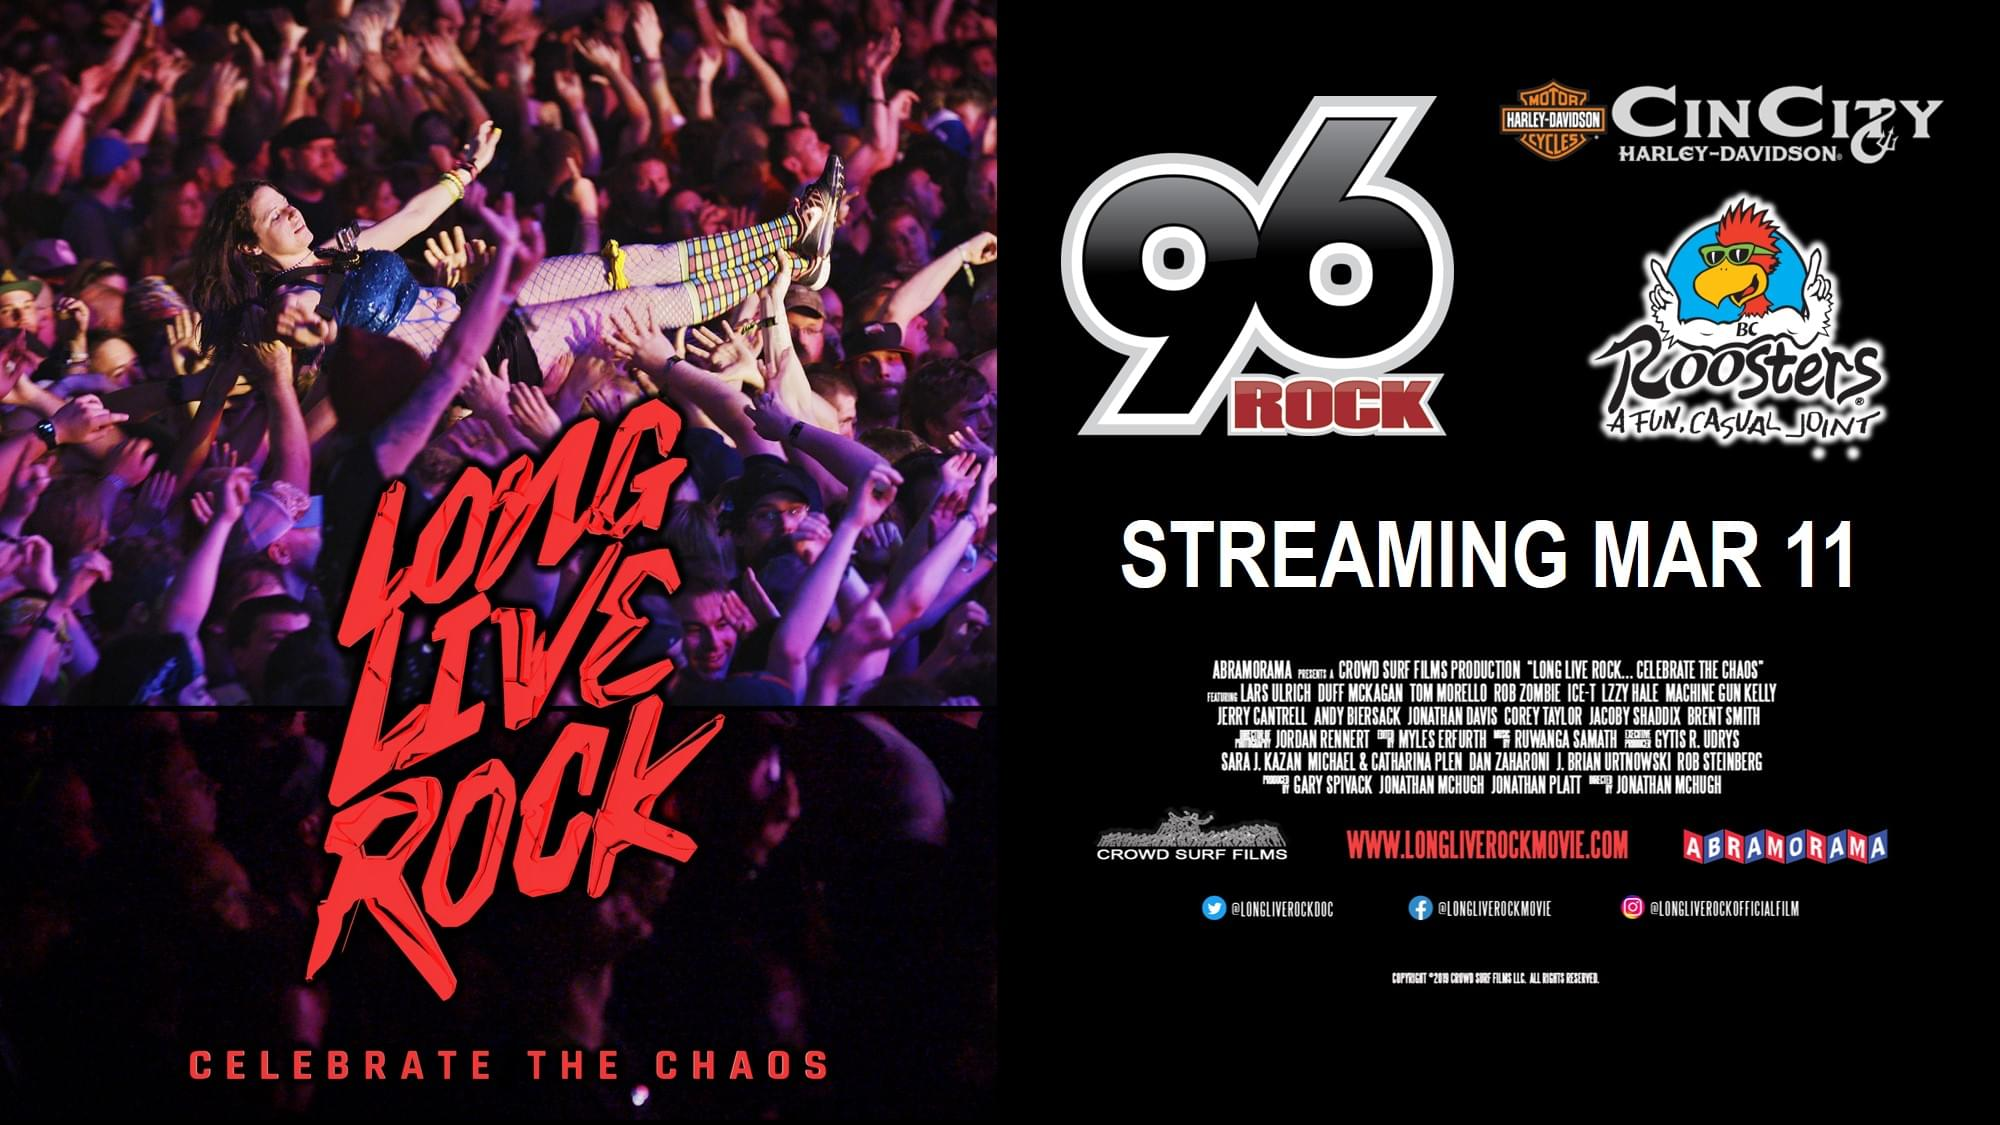 Long Live Rock Art HD Roosters